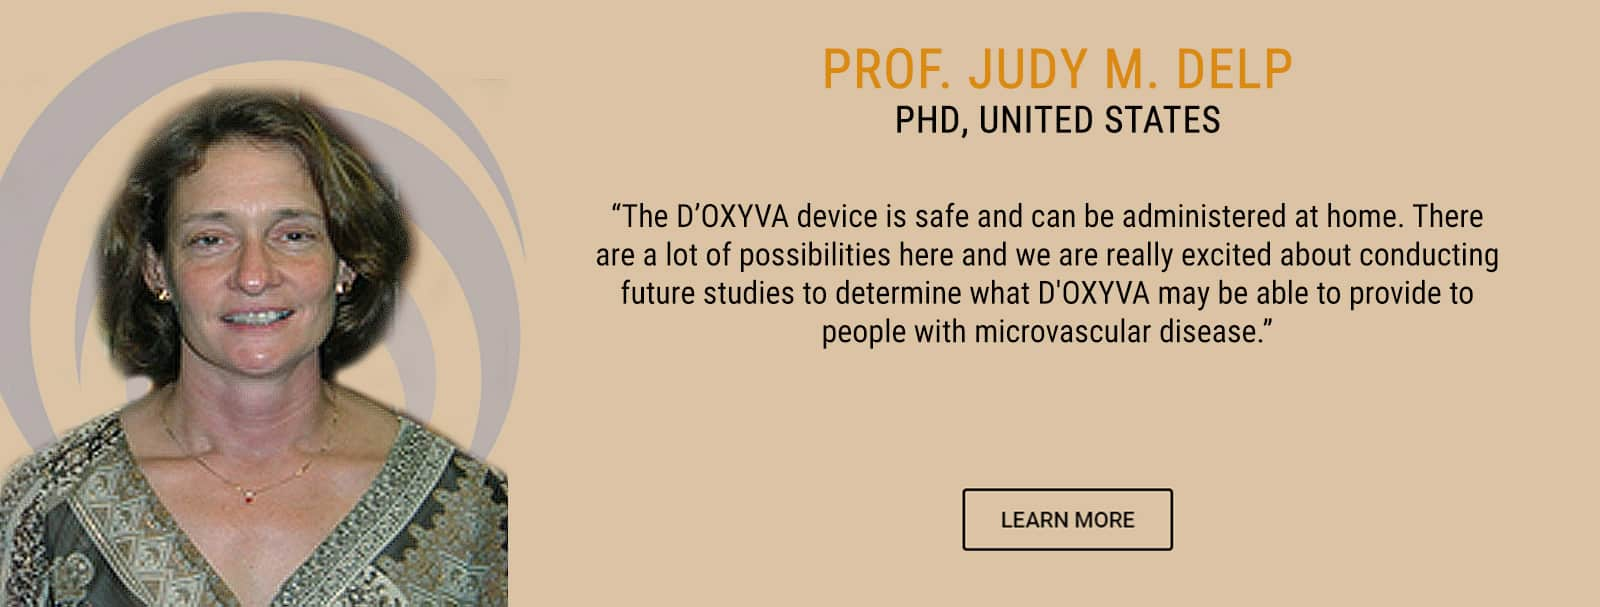 Prof. Judy Delp